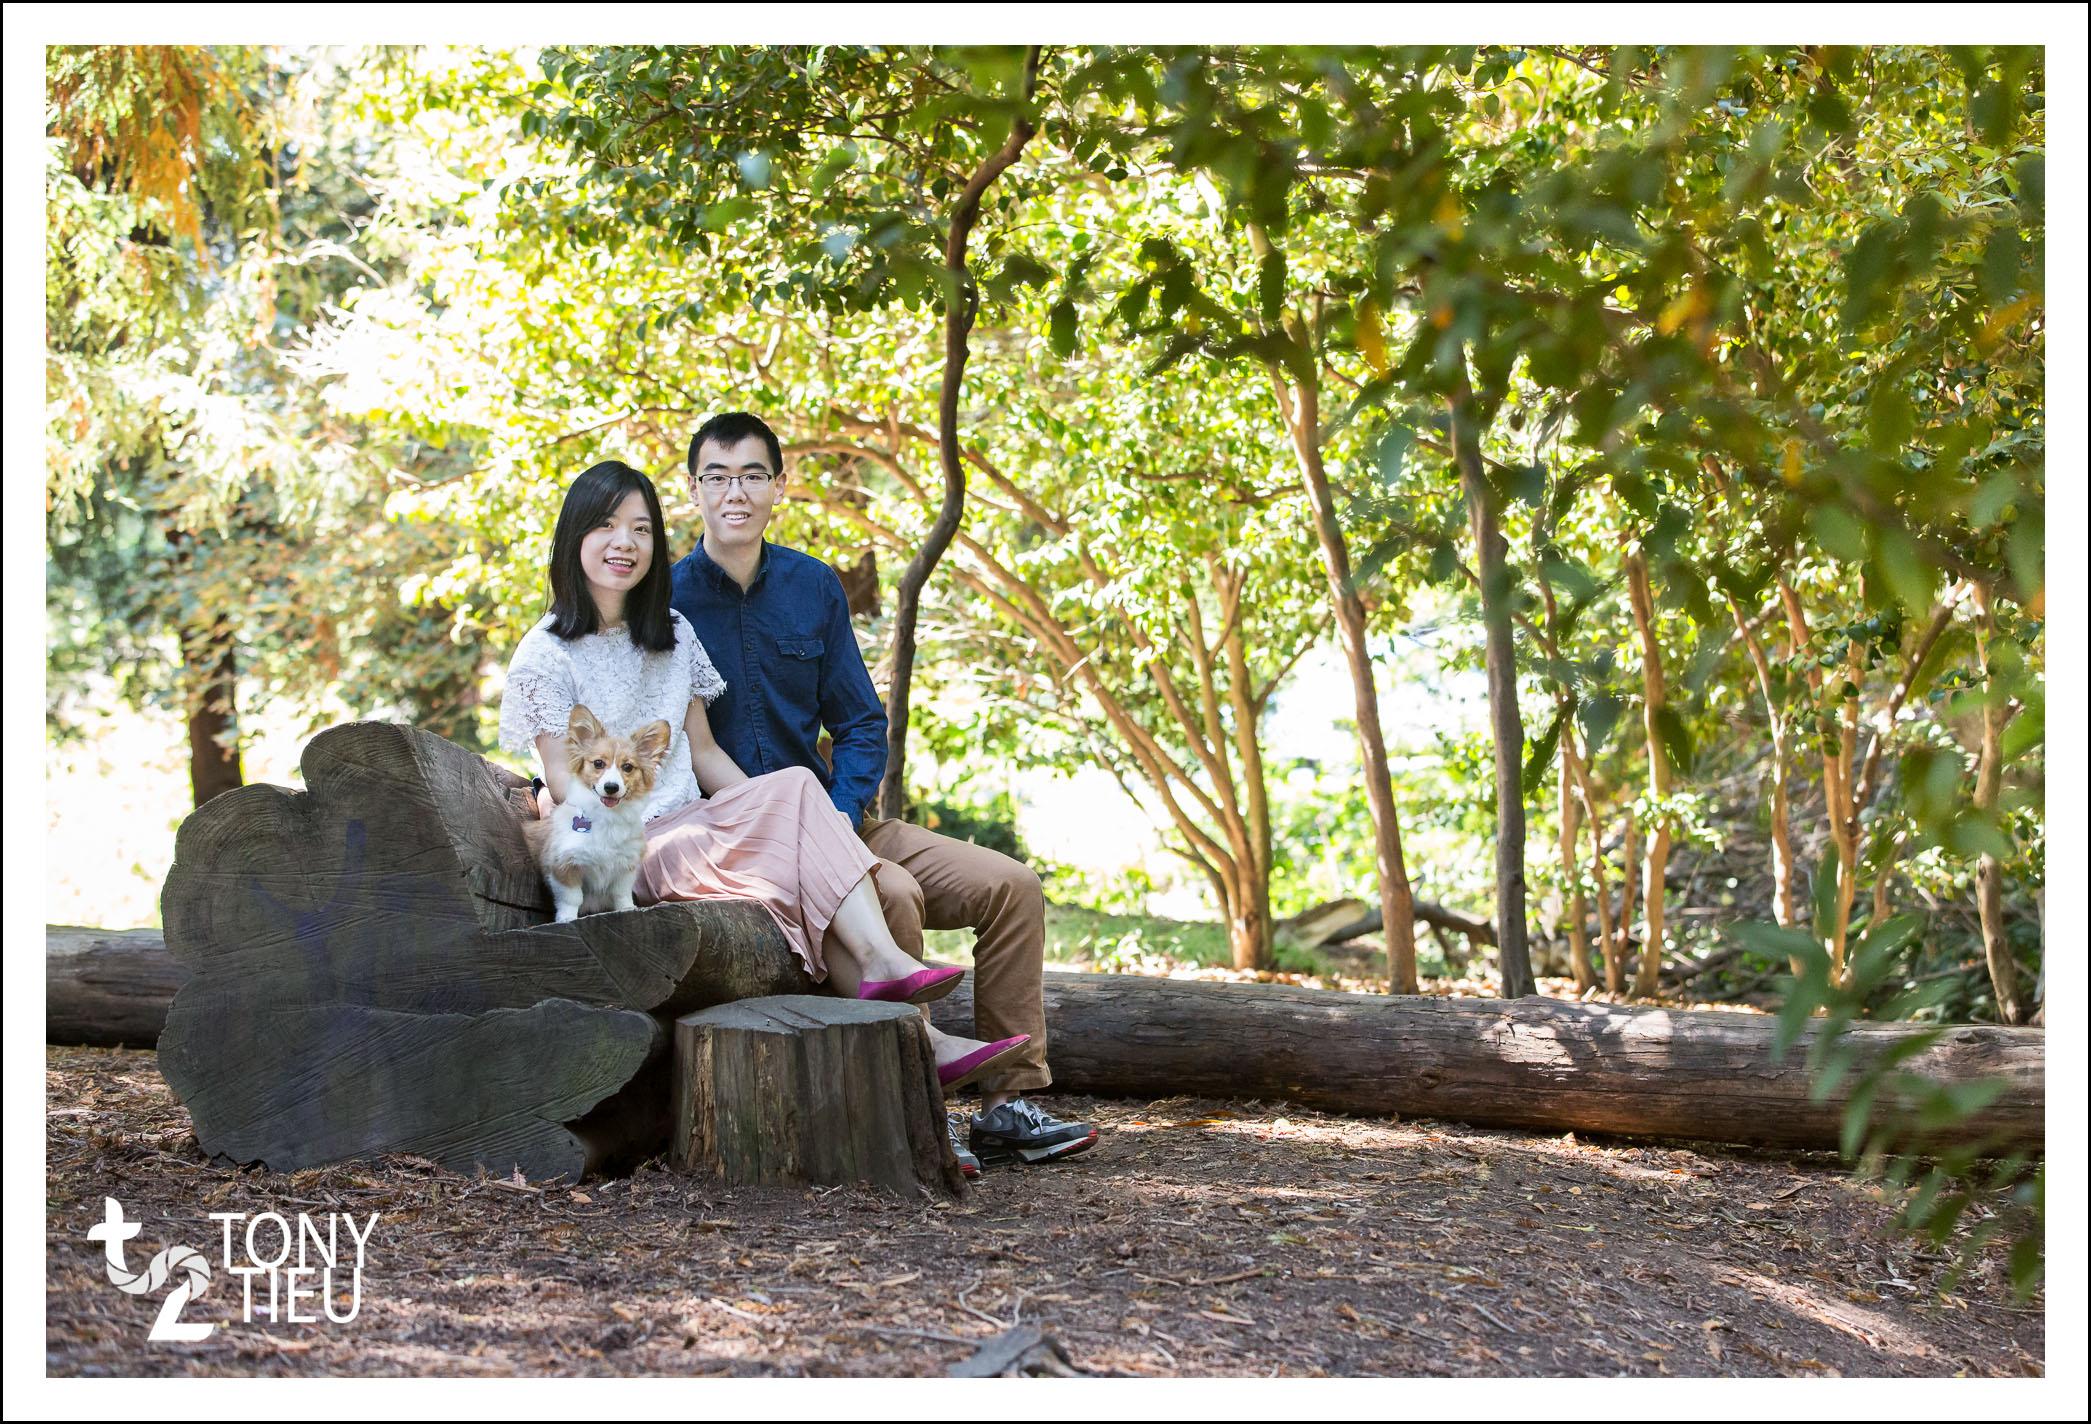 Tony_Tieu_Jiabin Liu_6.jpg